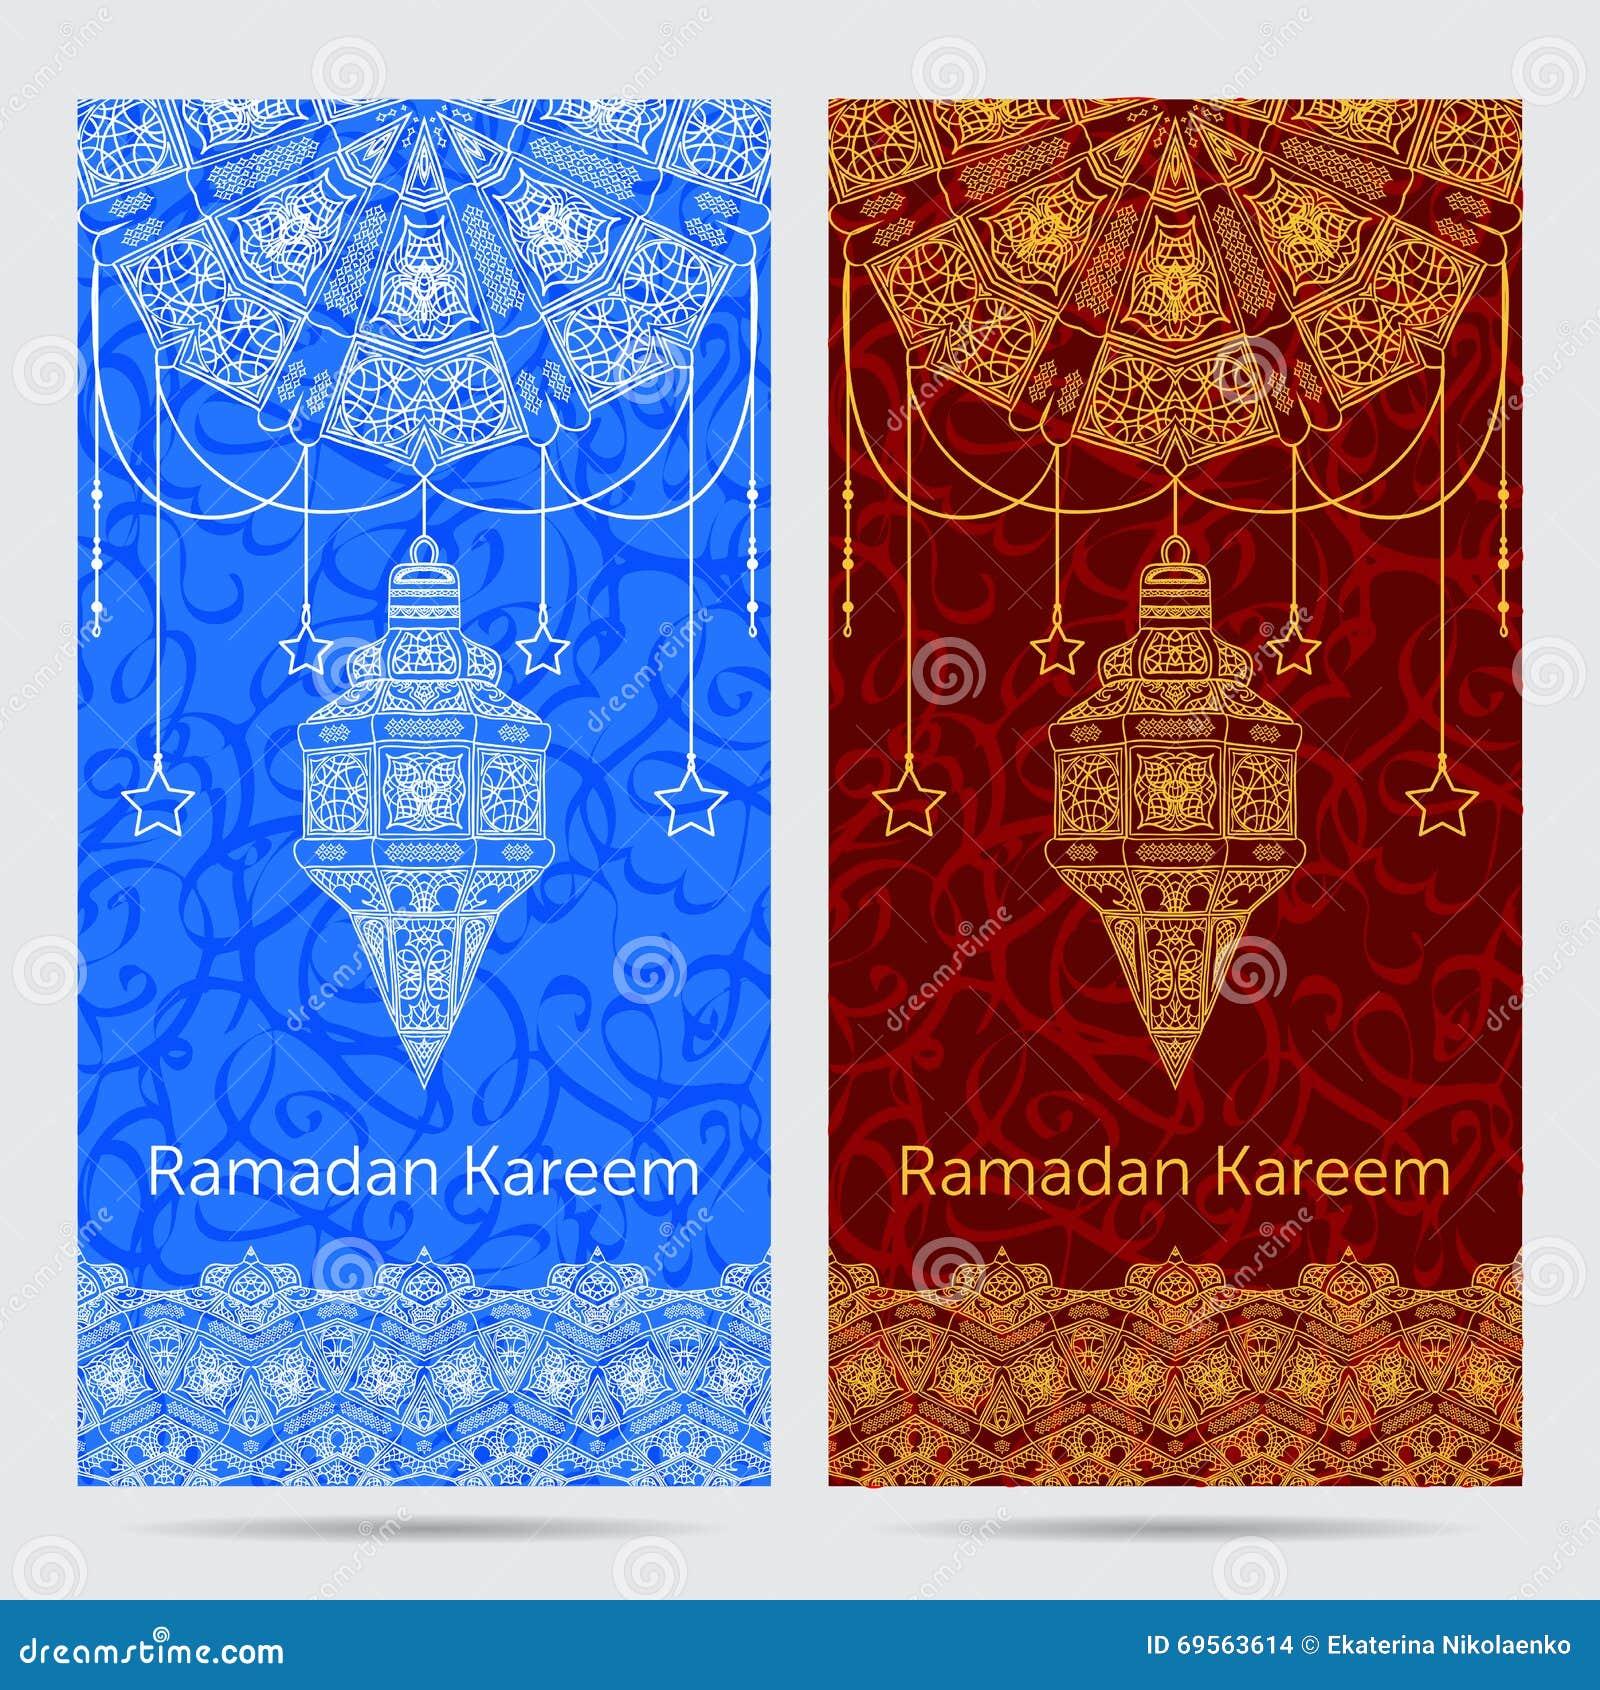 Beautiful greeting card for muslim community festival ramadan kareem beautiful greeting card for muslim community festival ramadan kareem m4hsunfo